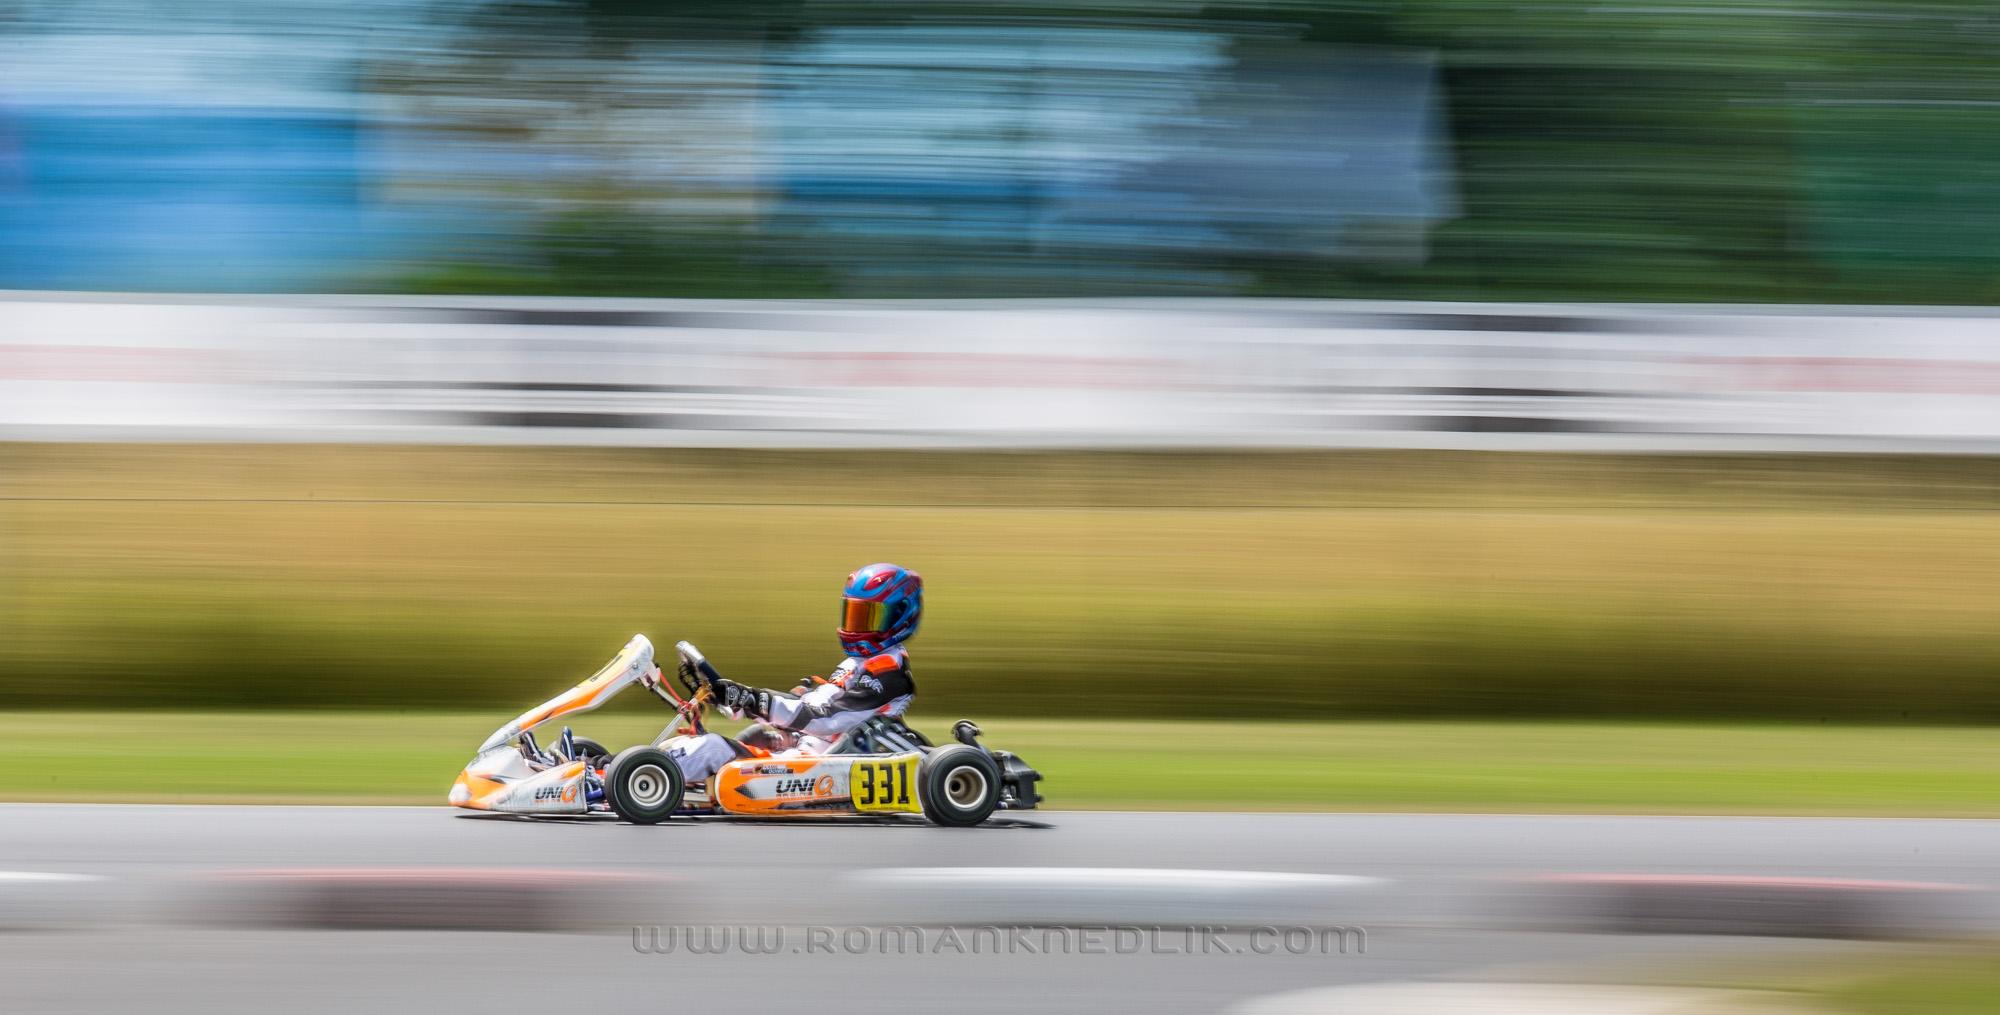 Race_Rotax_Europa-34